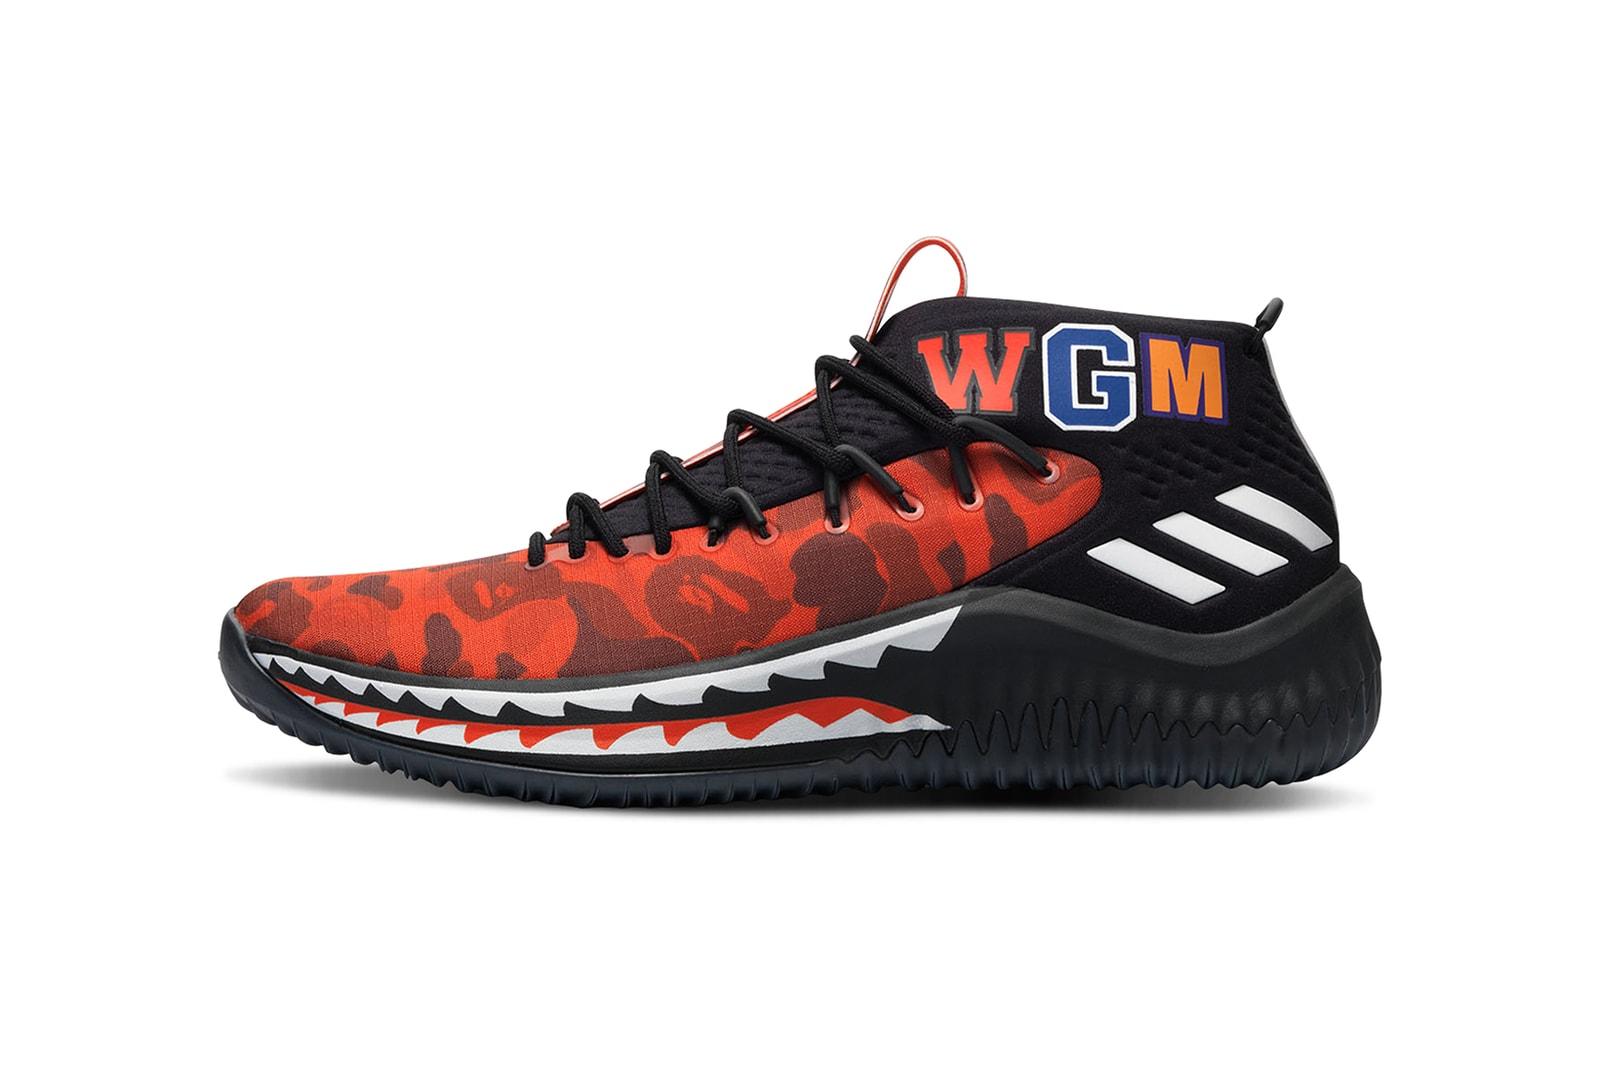 1d9b9a72e42e3 Best Sneaker Releases  February 2018 Week 3